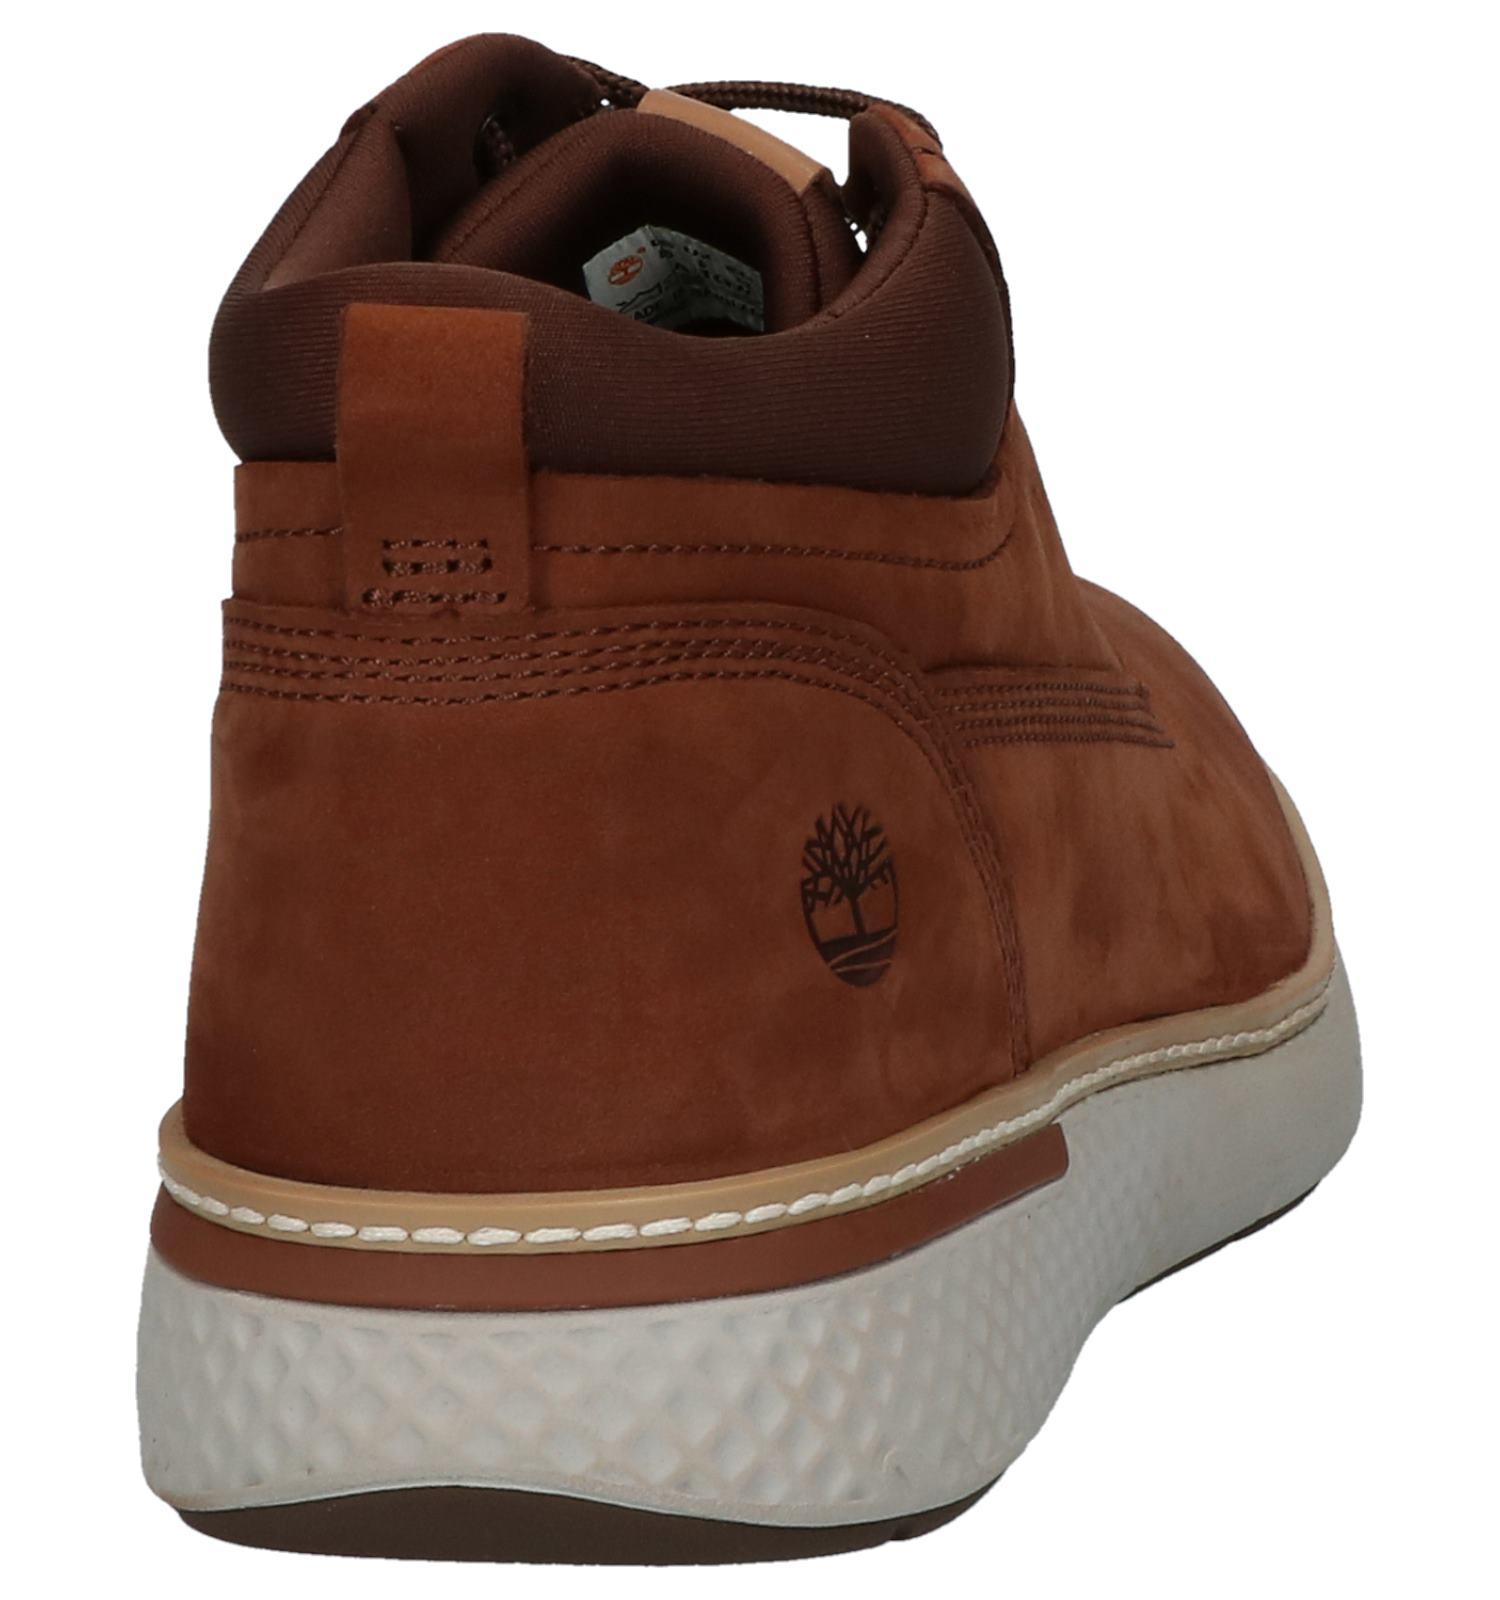 Boots Bruine Timberland Cross Chukka Mark UMpSzV